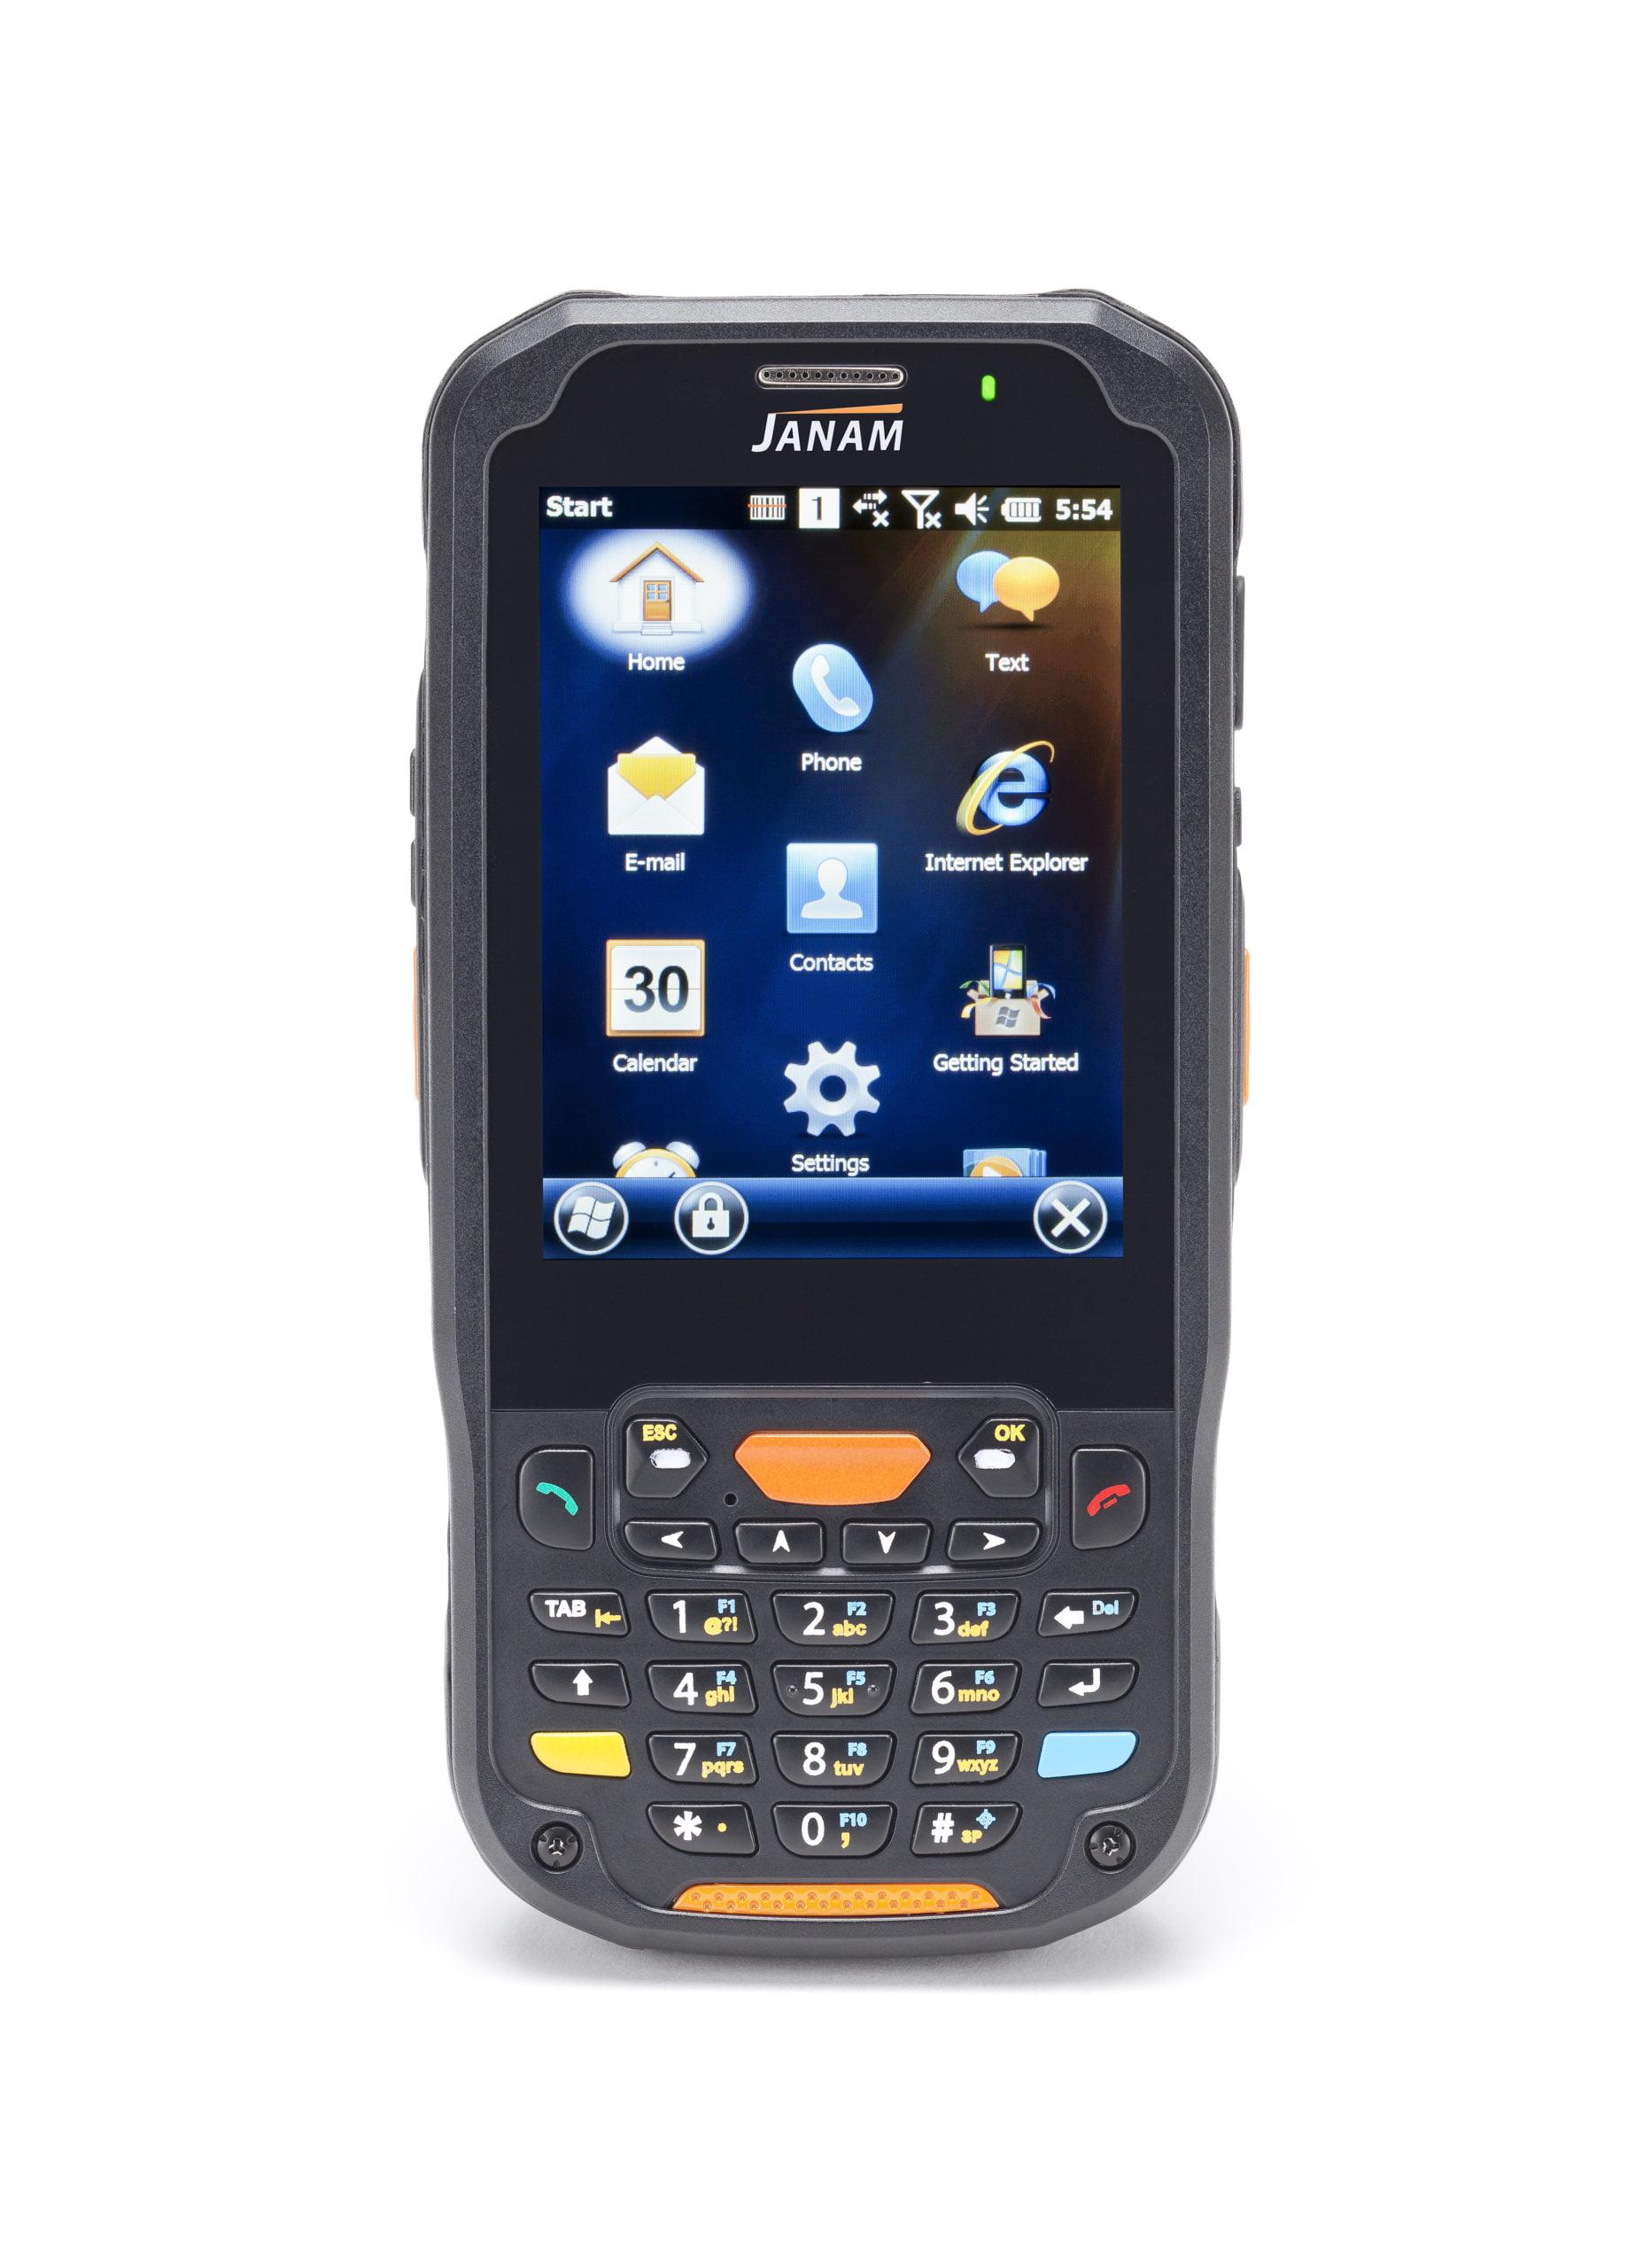 Intrinsically-Safe-Mobile-Computer-Janam-XM5-Windows-Embedded-Handheld-6.5-With-Numerical-Keypad